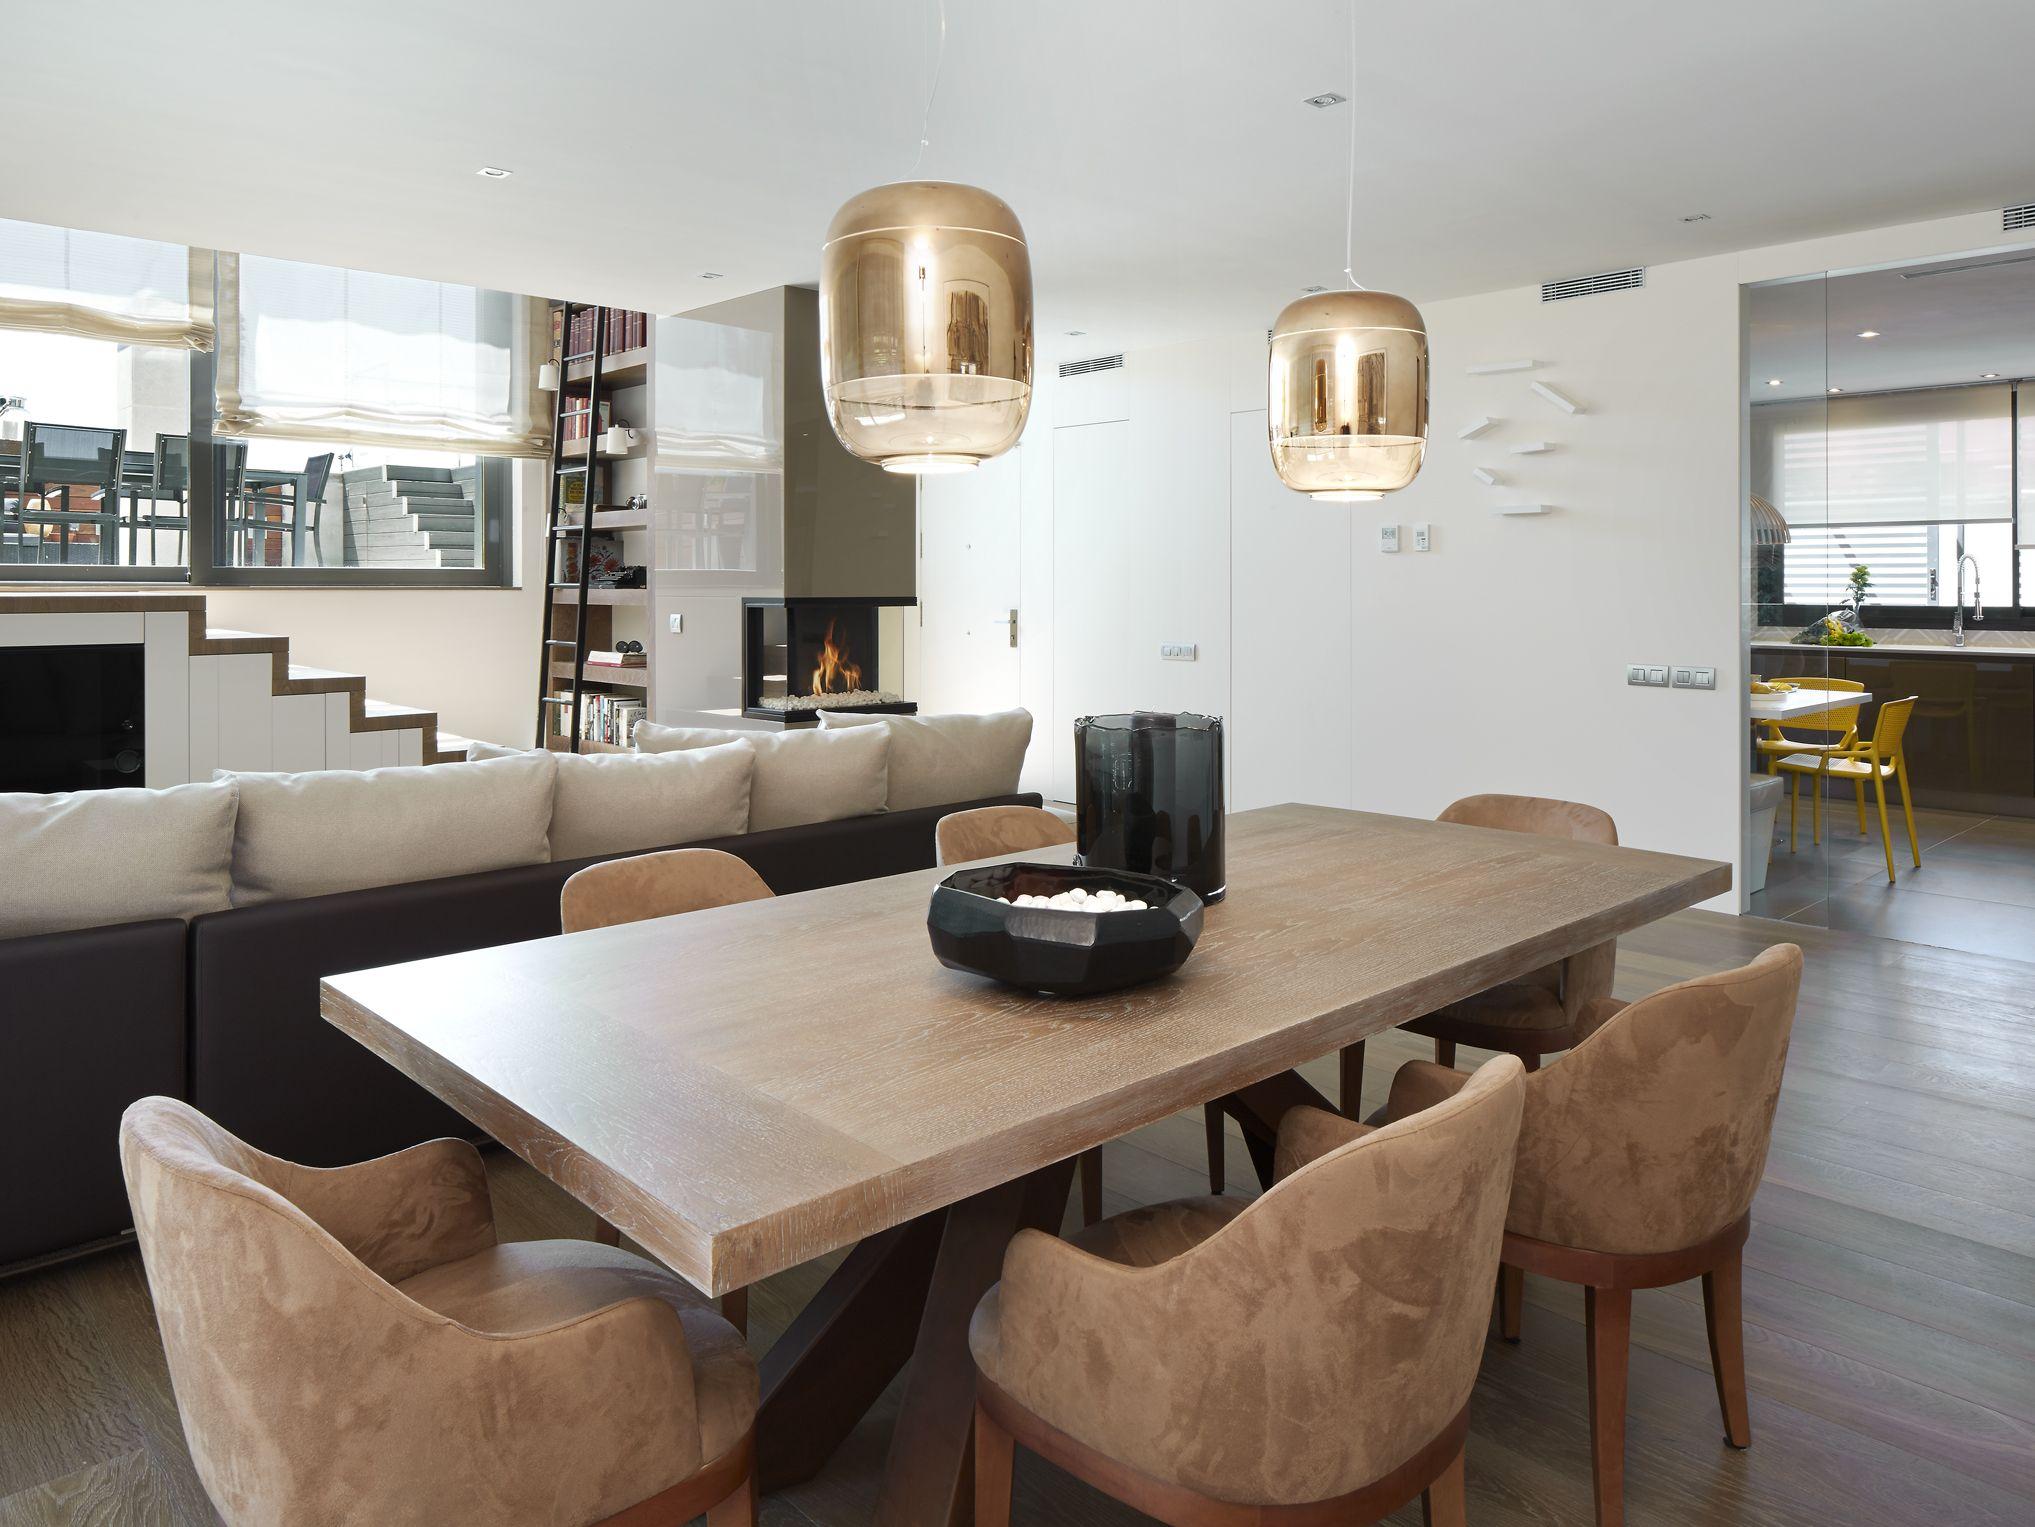 MolinsDesign | Diseños Modernos para #Comedores #DecoracionComedor ...